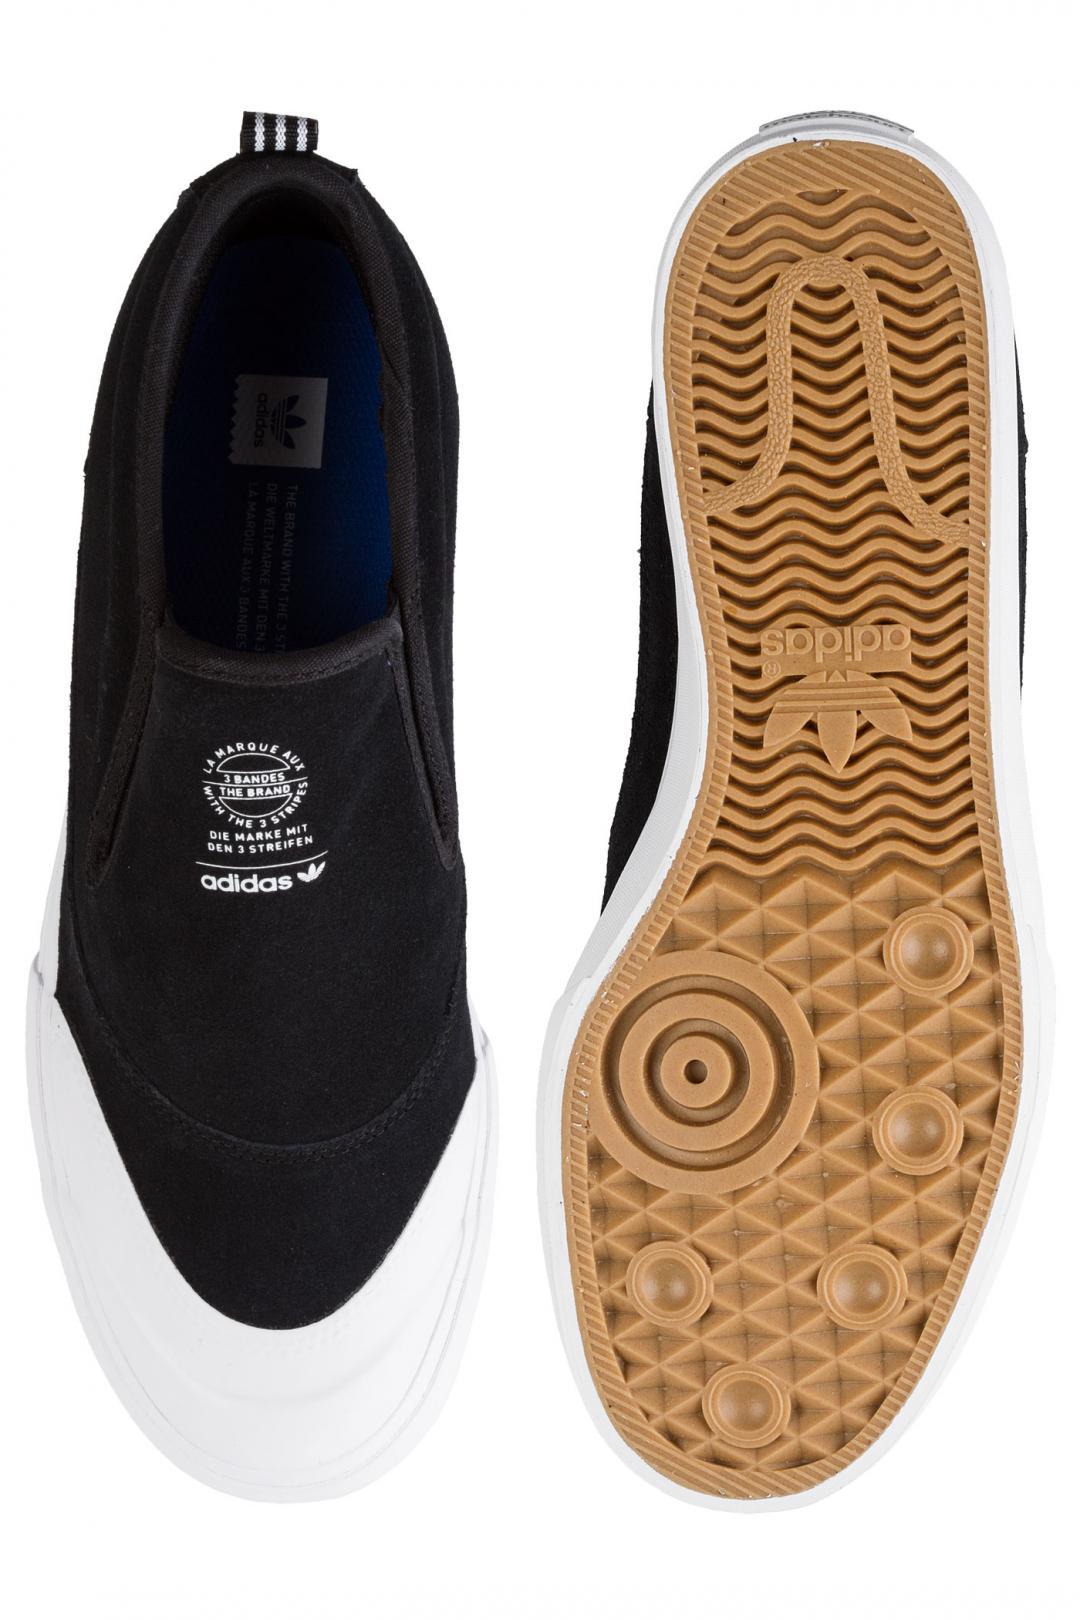 Uomo adidas Skateboarding Matchcourt Mid Slip core black white gum   Sneakers slip on